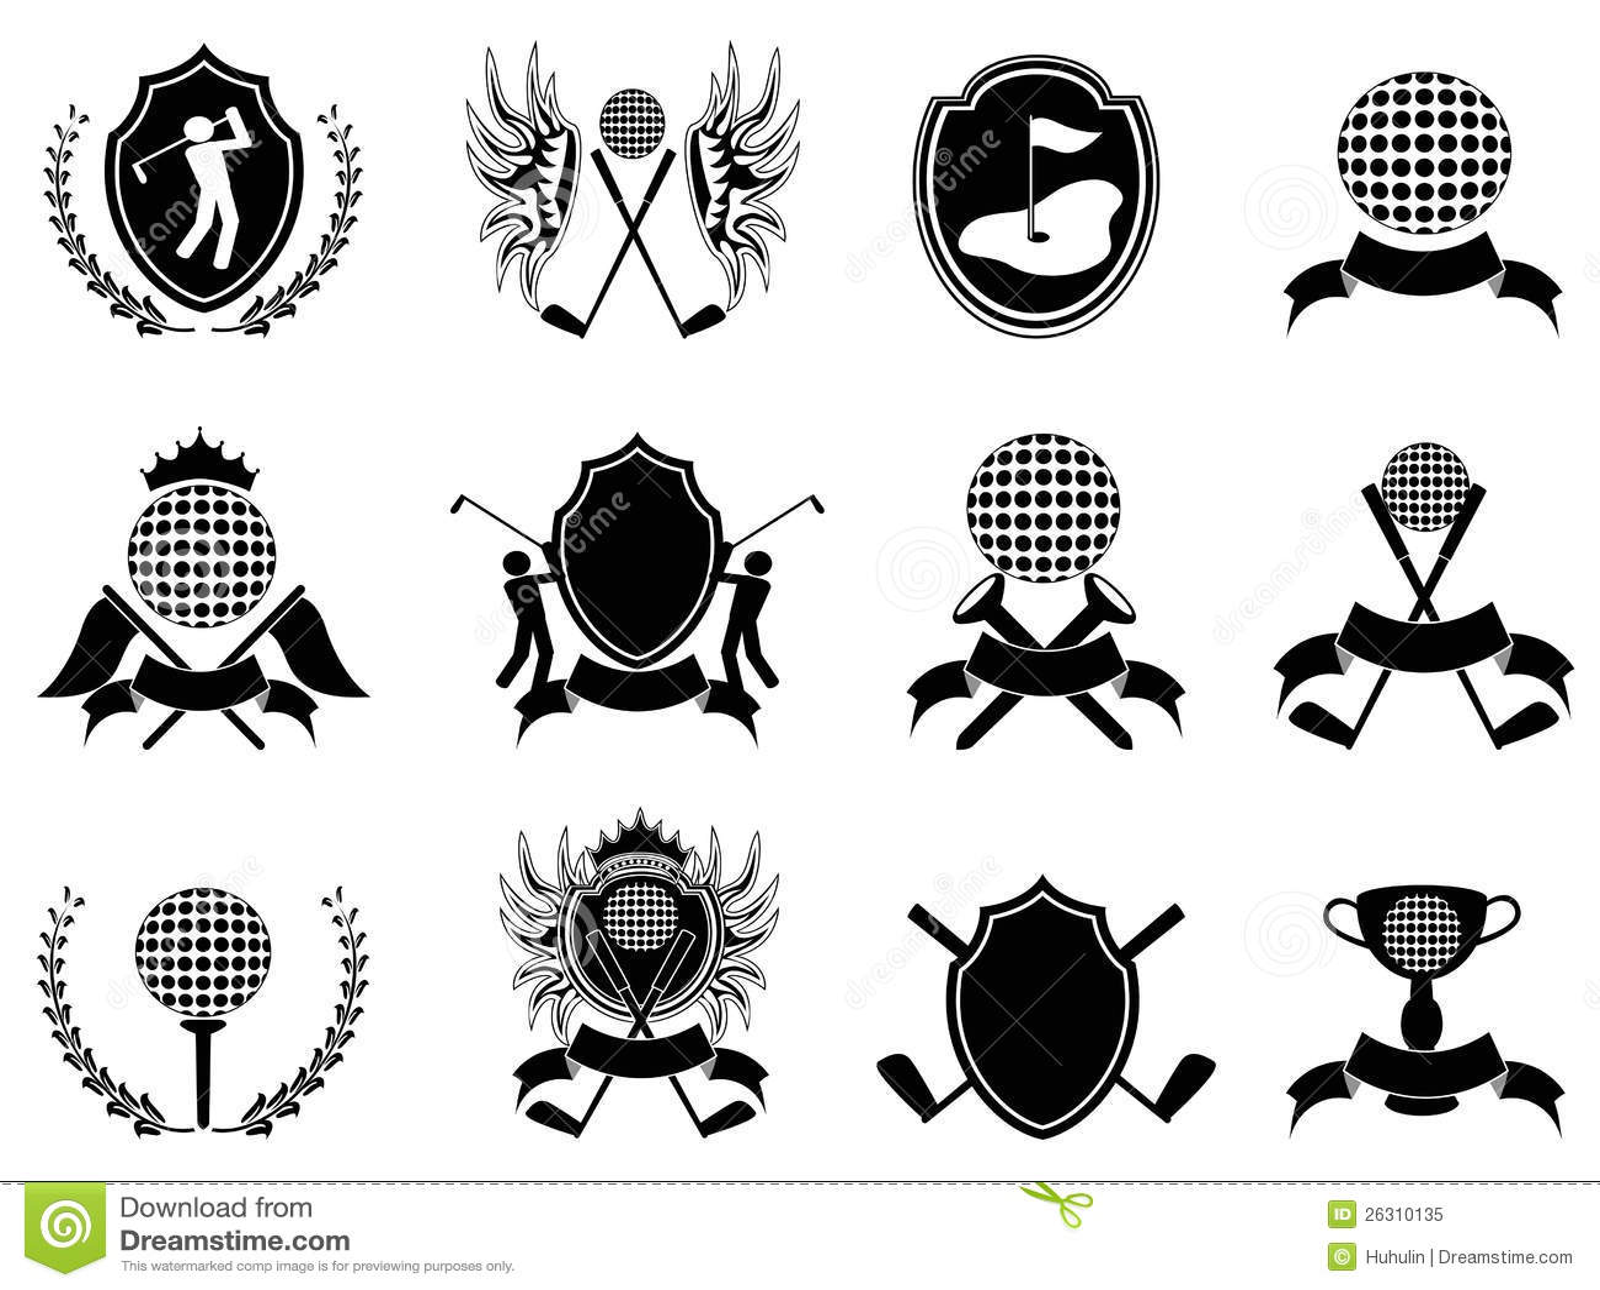 Black Golf Insignia Royalty Free Stock Photo